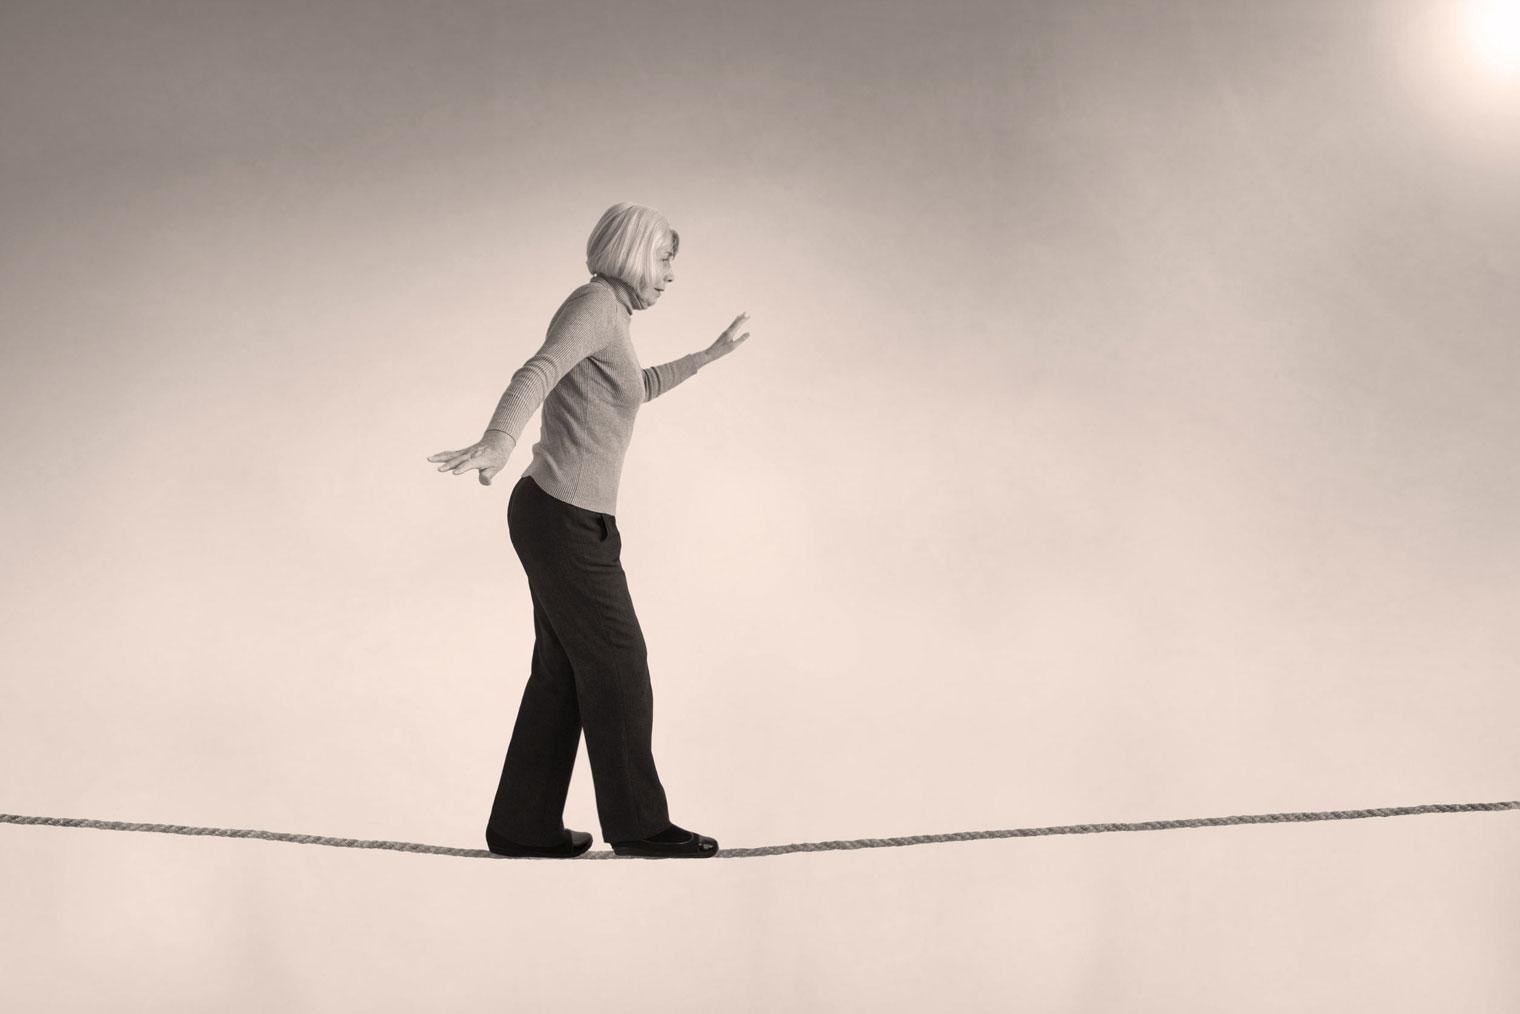 l'équilibre postural - UPVD